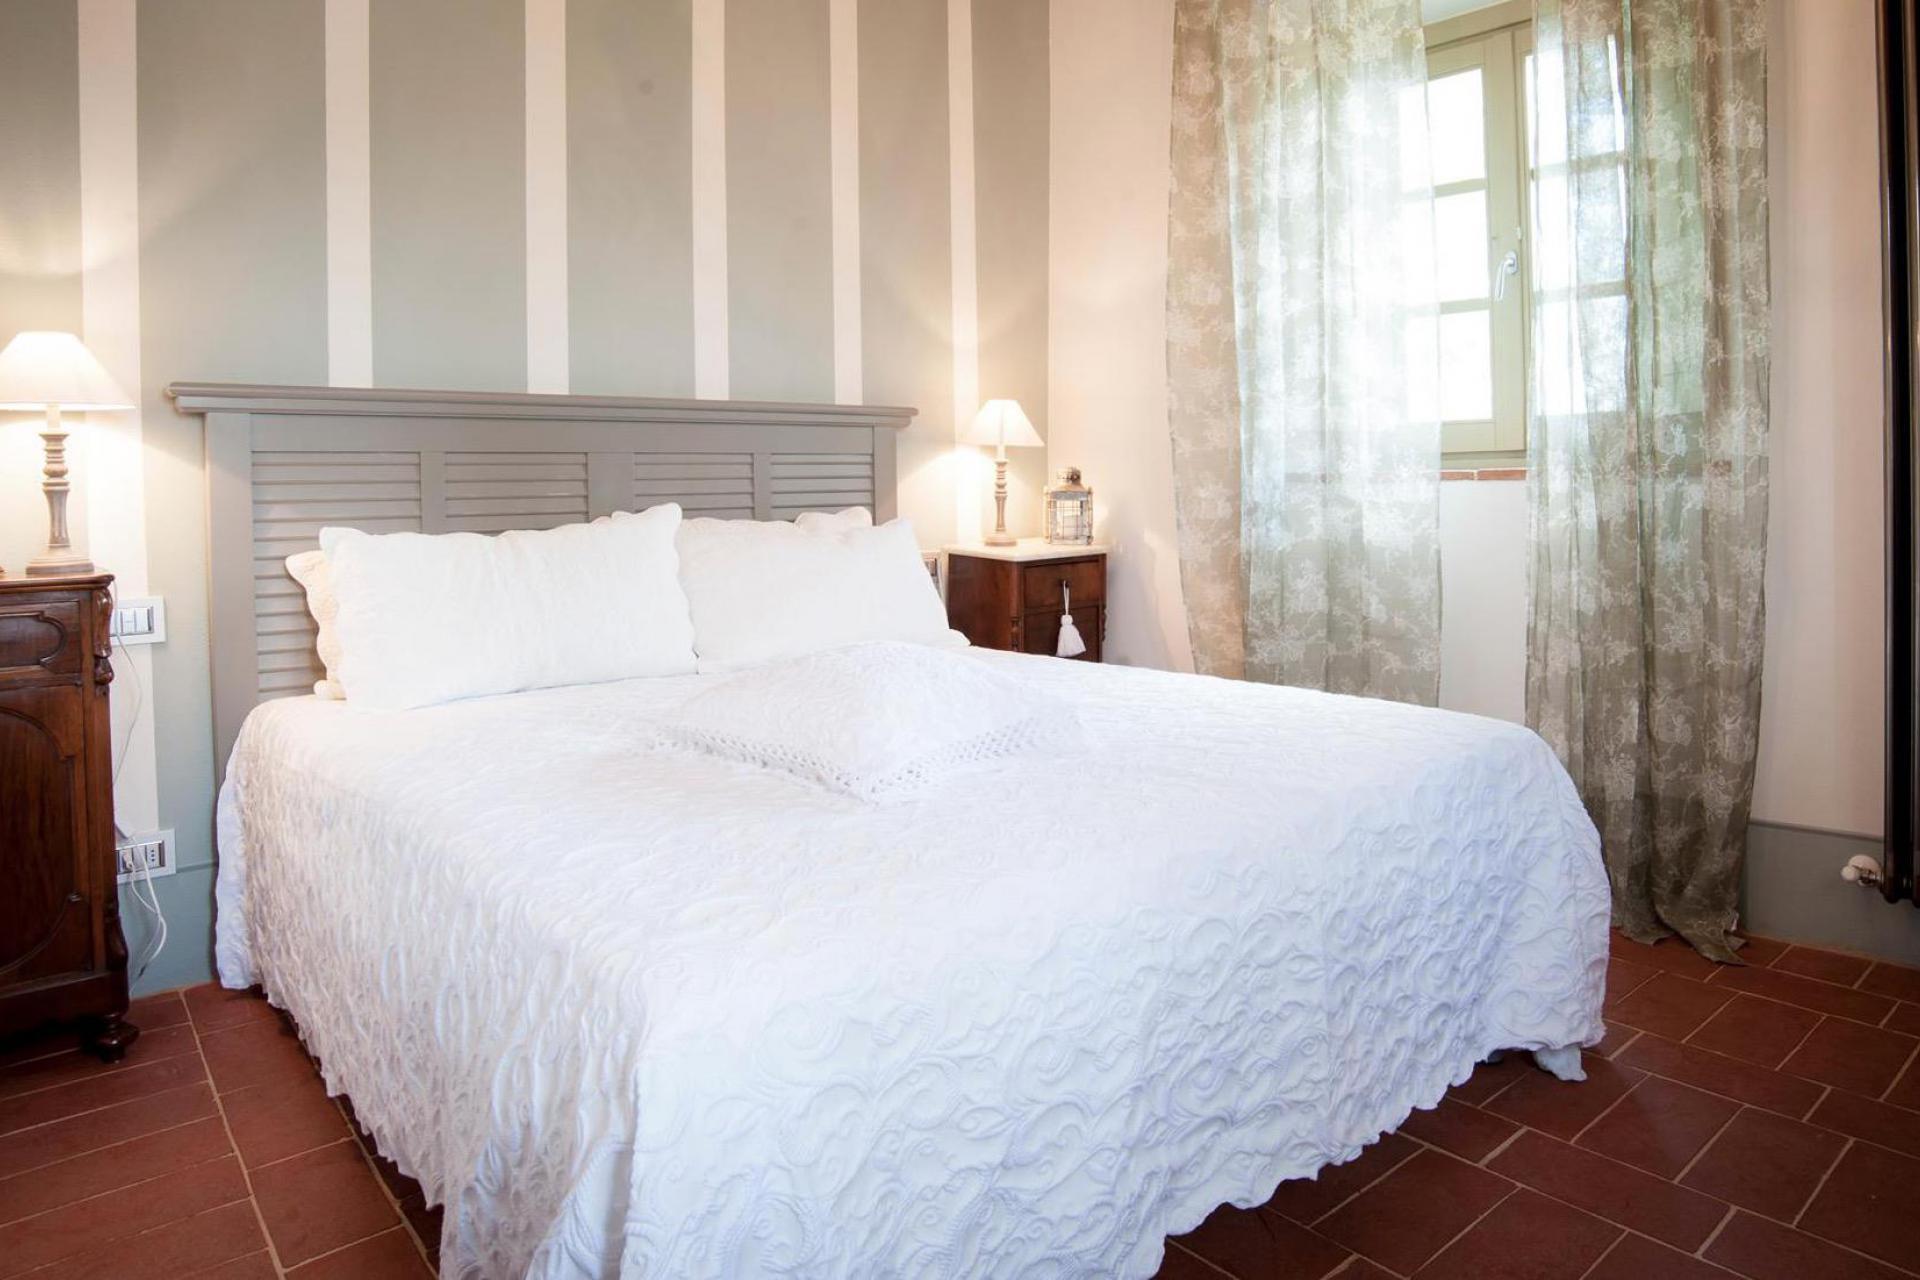 Agriturismo Toscane 11 appartementen met designinterieur in Toscane | myitaly.nl